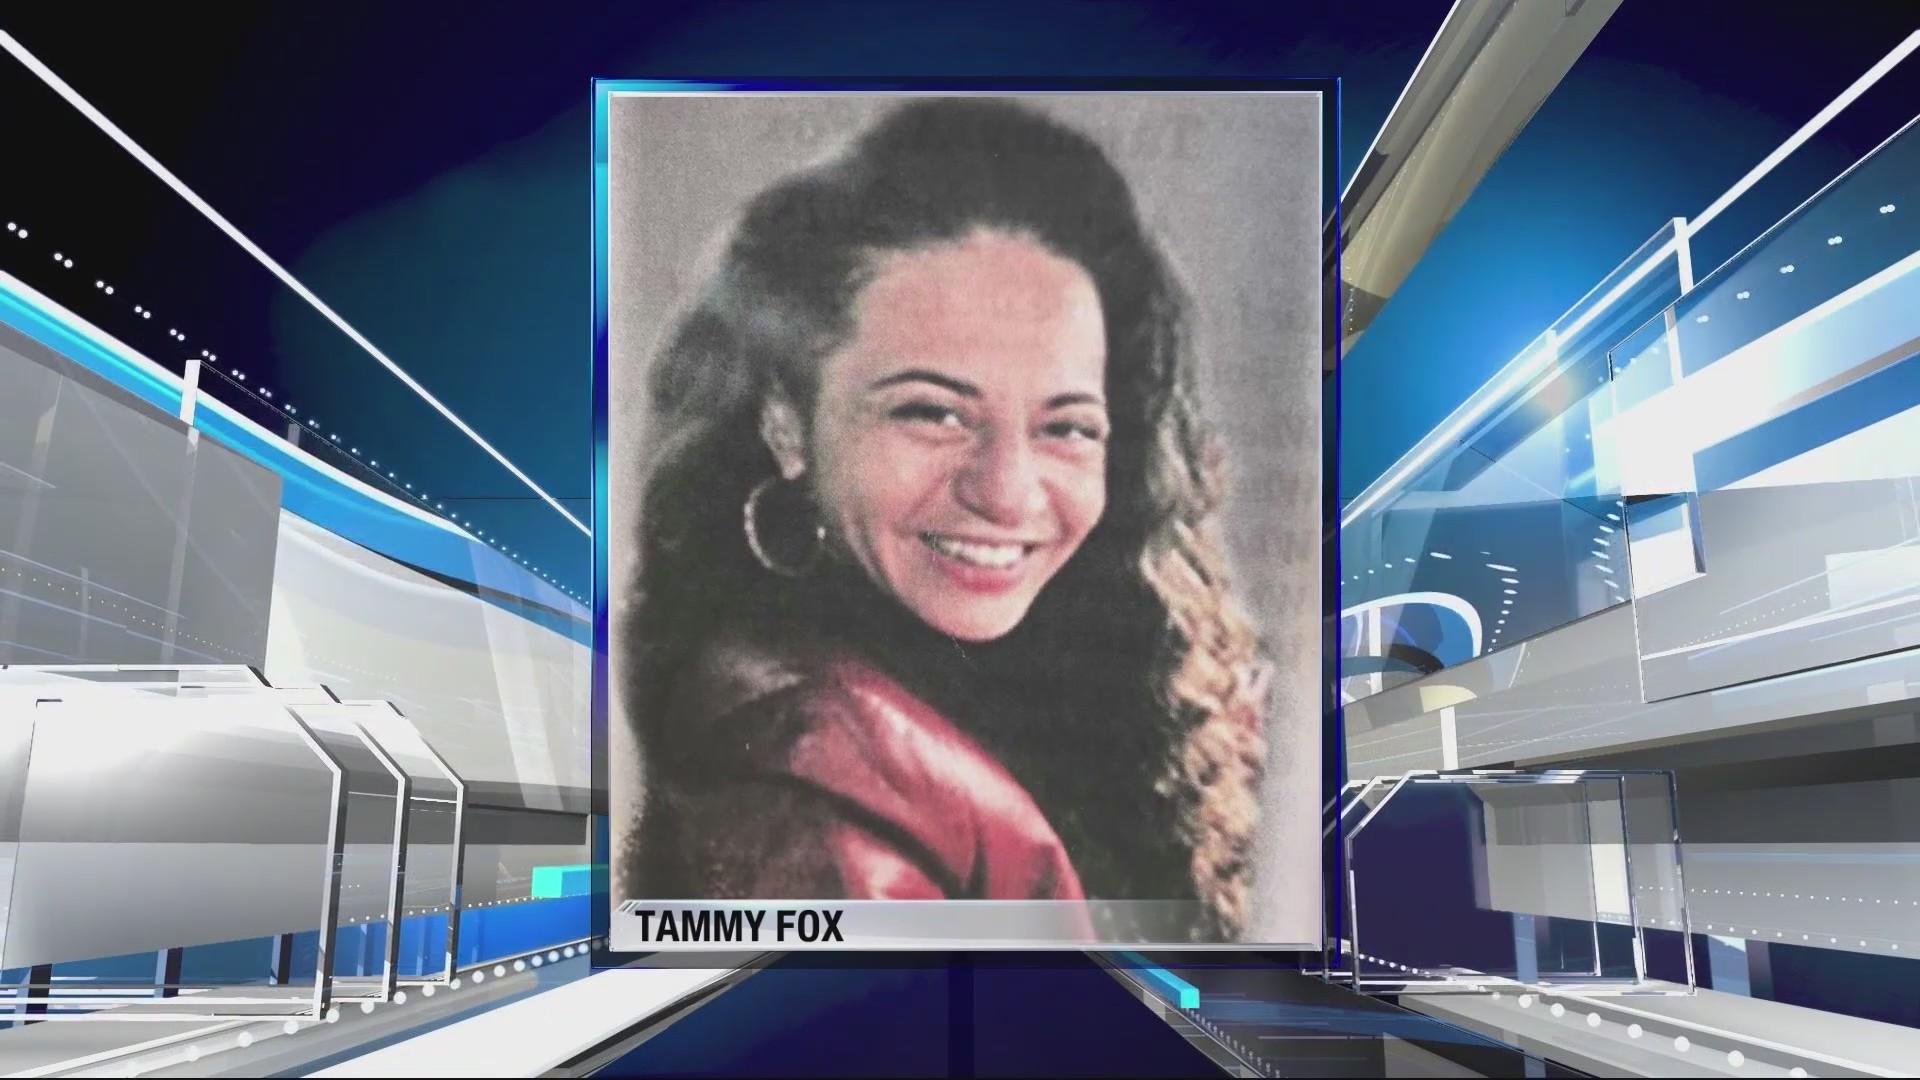 Homicide_investigation__Tammy_Fox_0_20180829210615